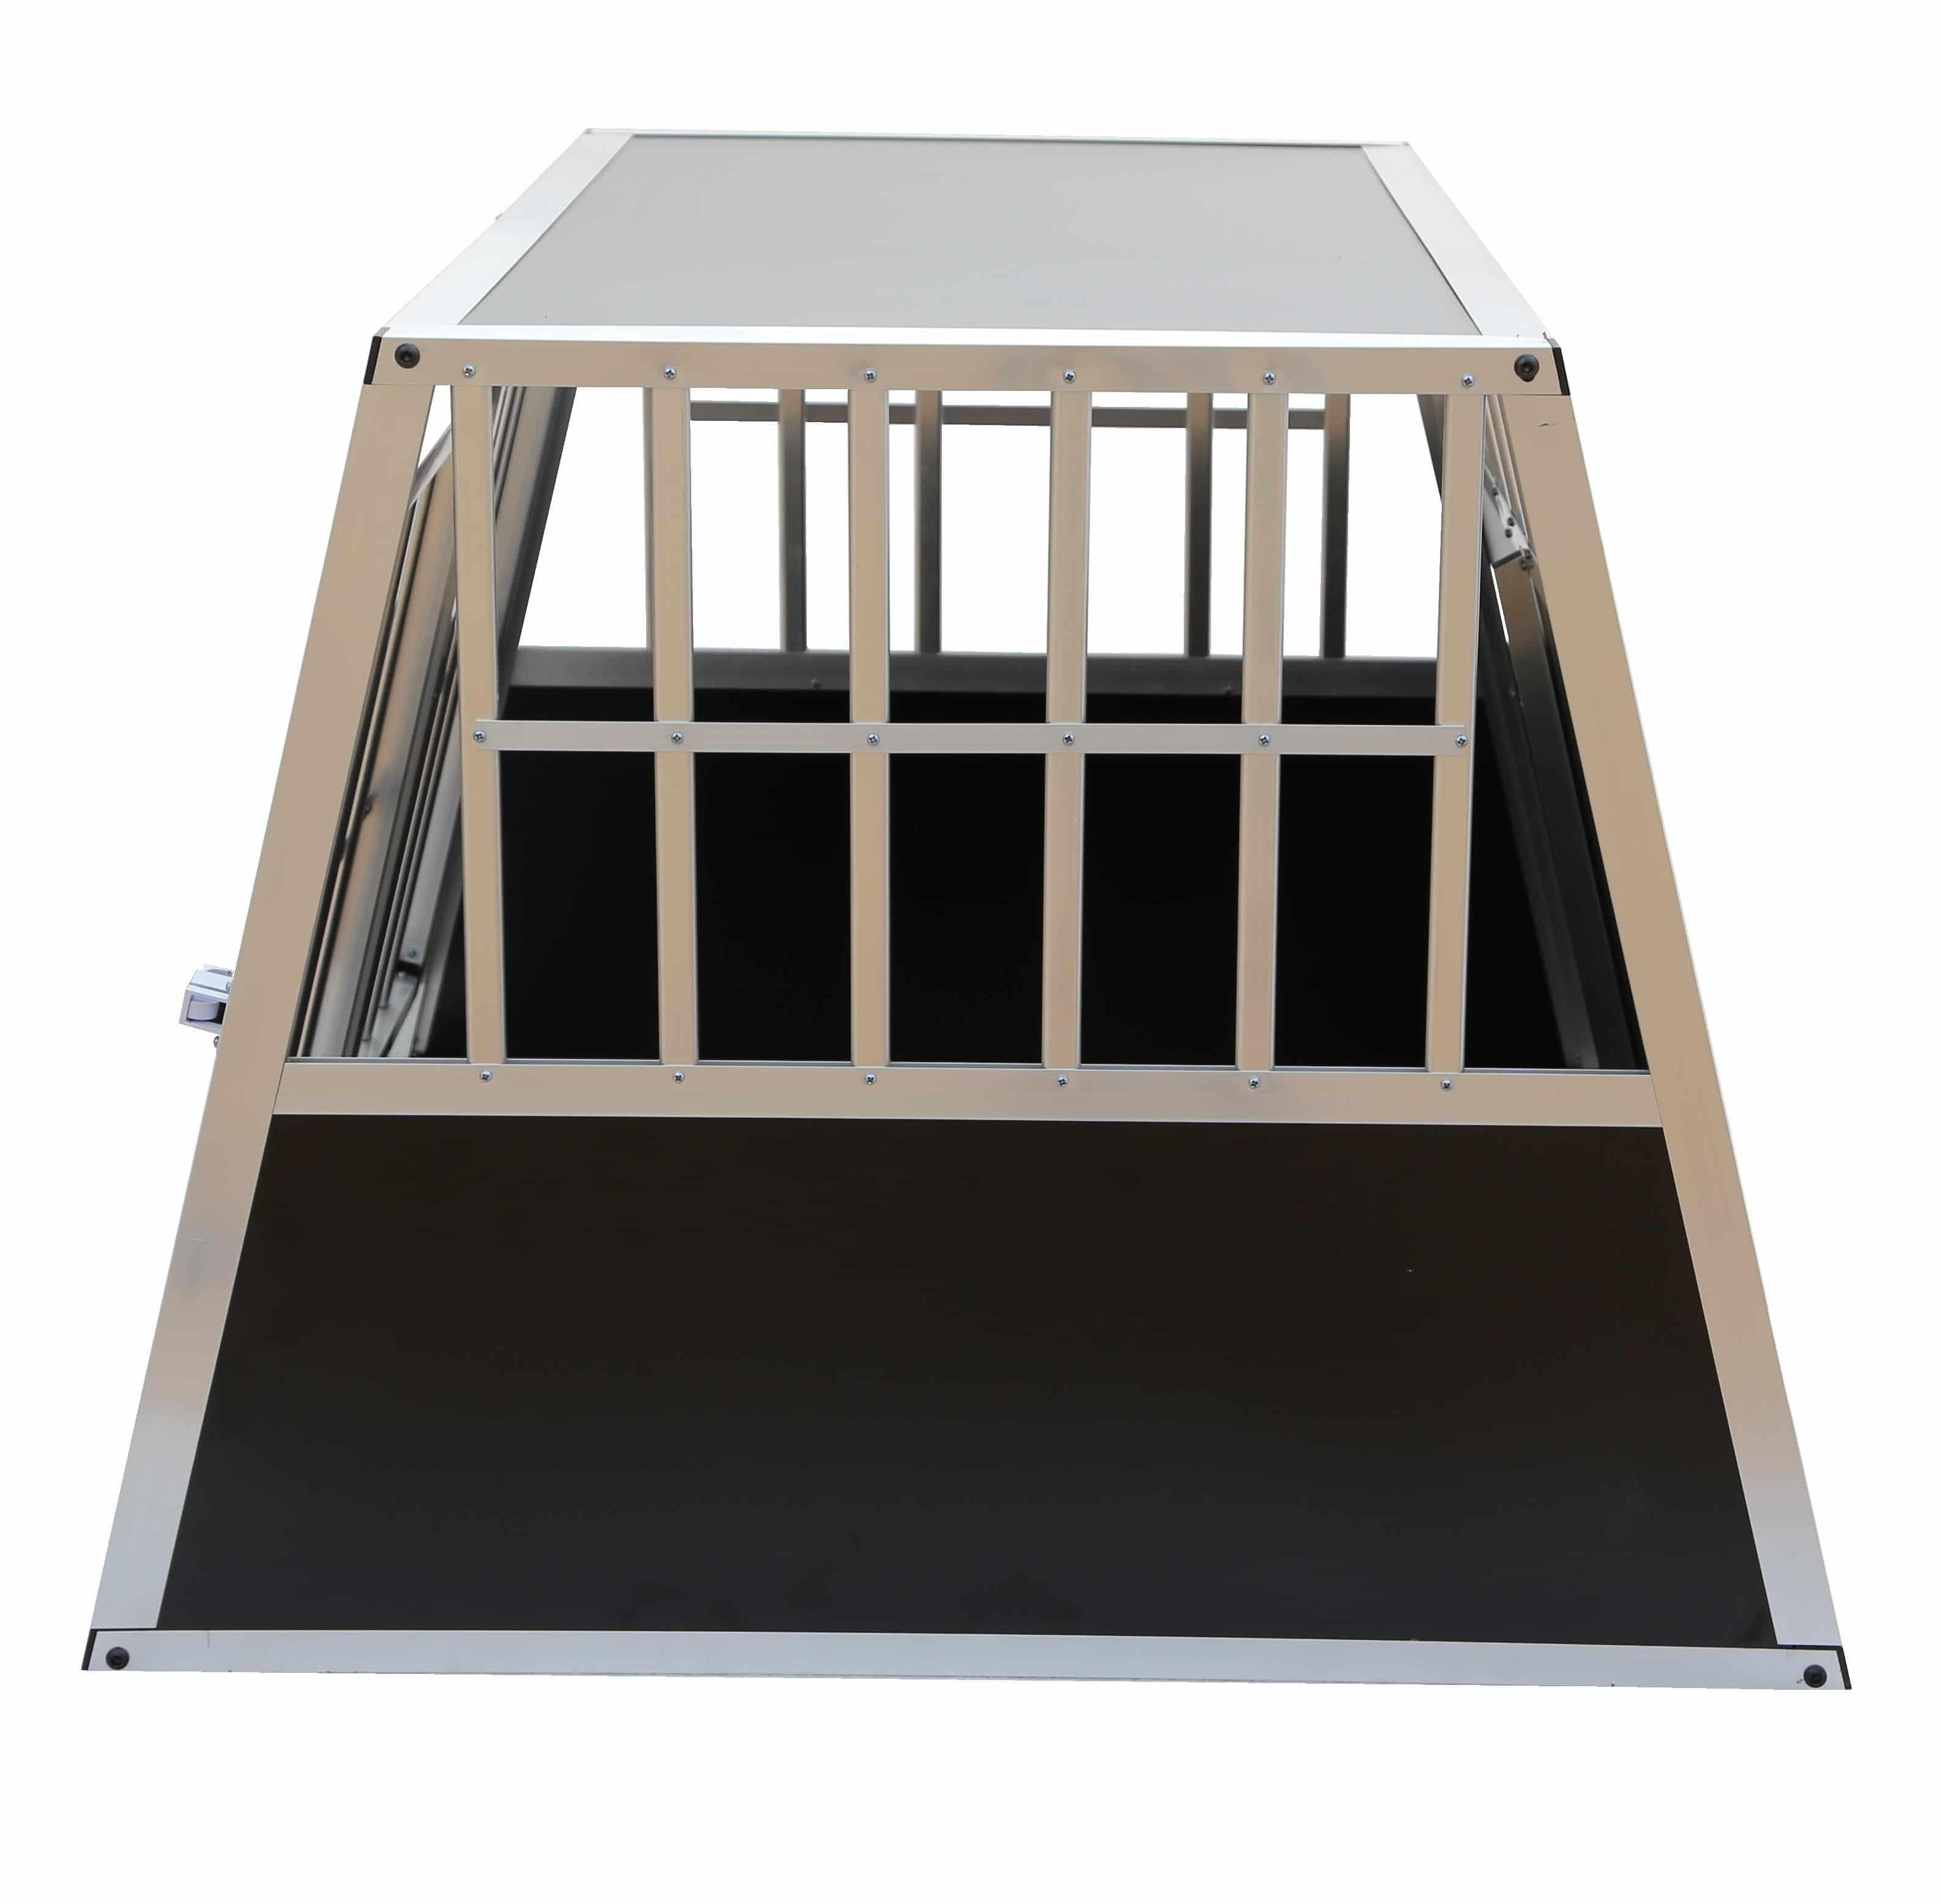 4animalz Trapeze Black Hondenbench voor 1 hond - 81x91x74 cm Medium